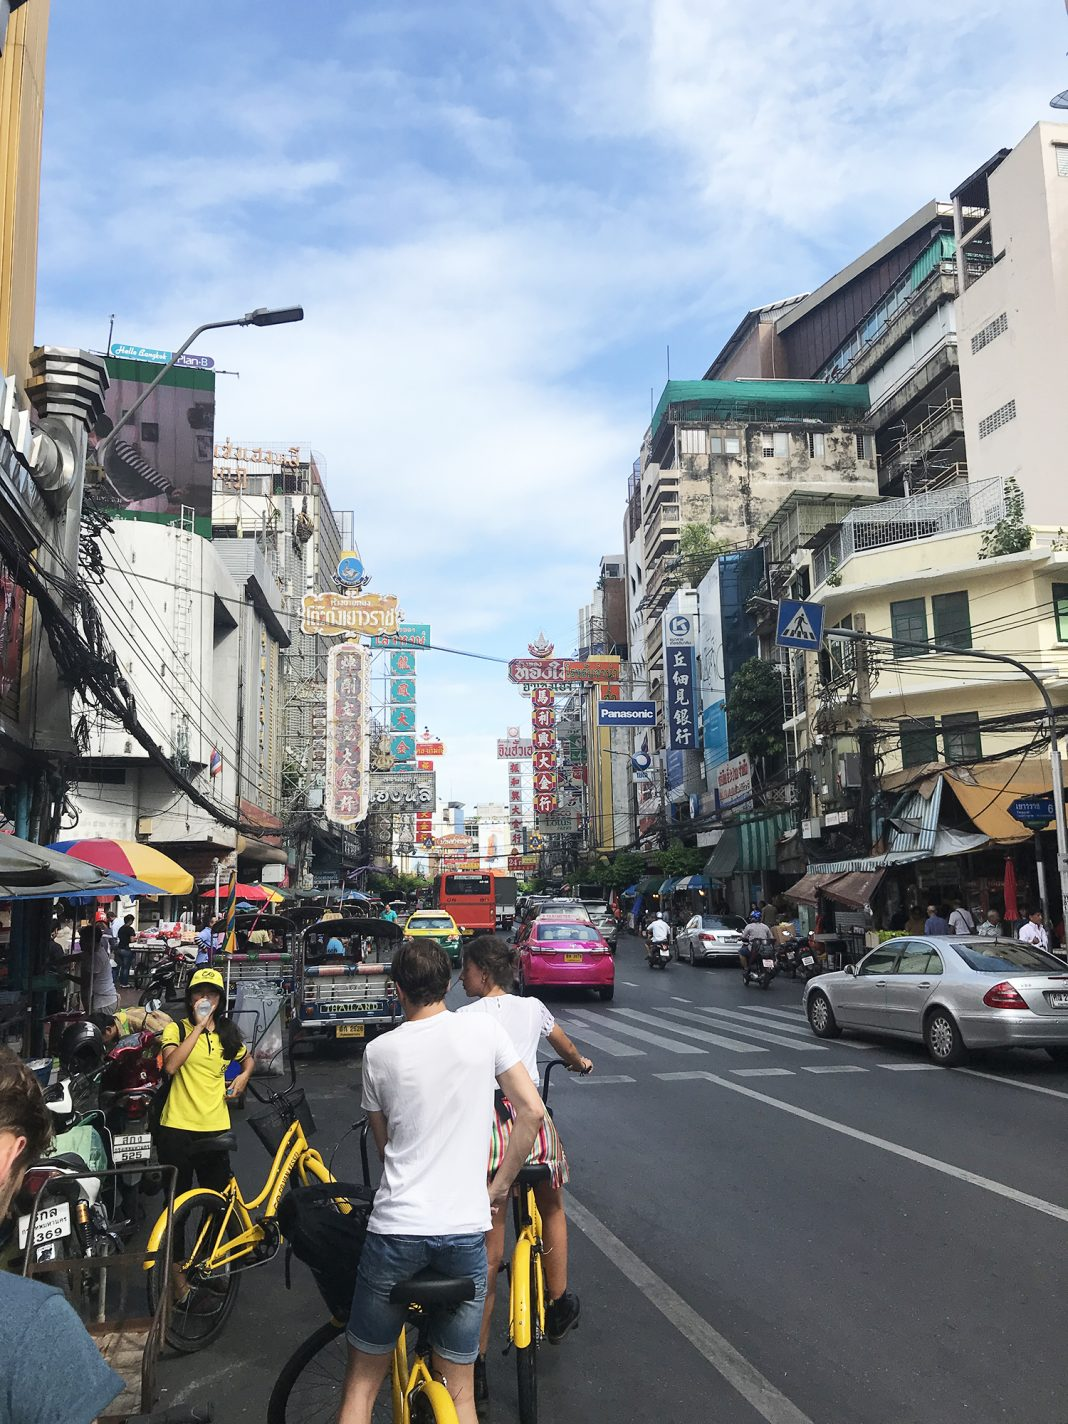 Een bruisende straat